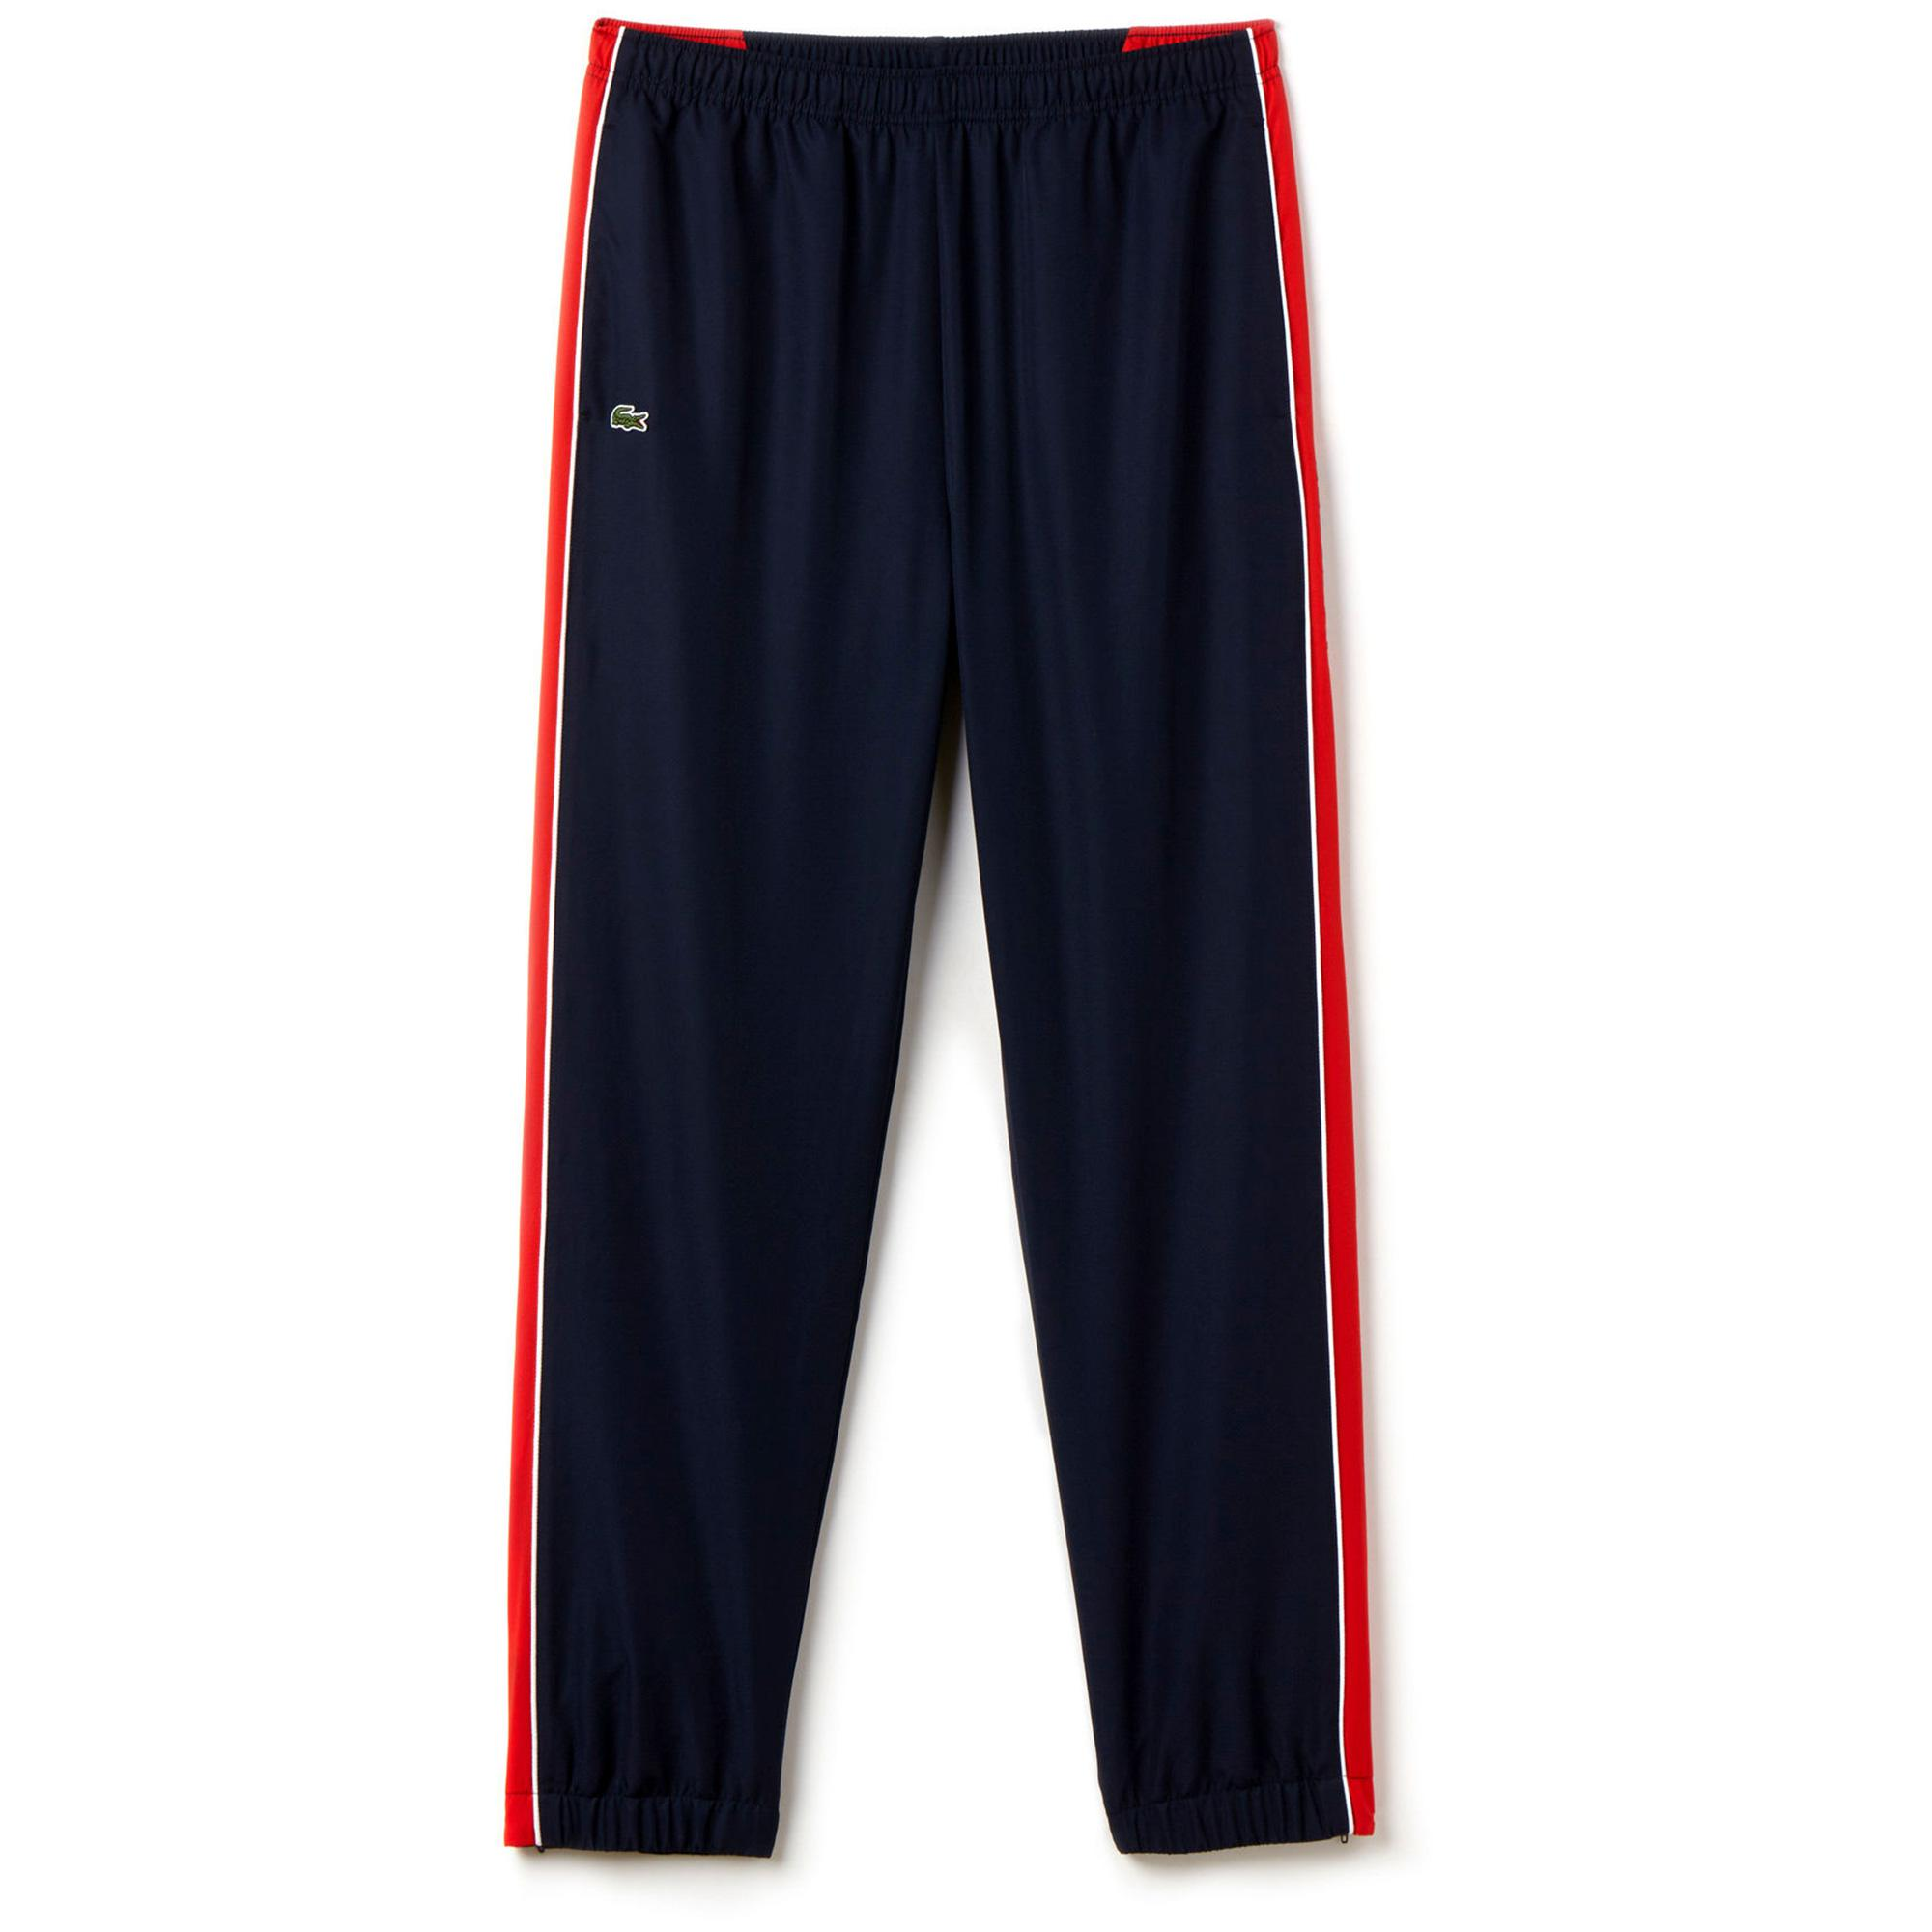 a4022145f094 Lacoste Sport Mens Tennis Trackpants - Blue Red - Tennisnuts.com